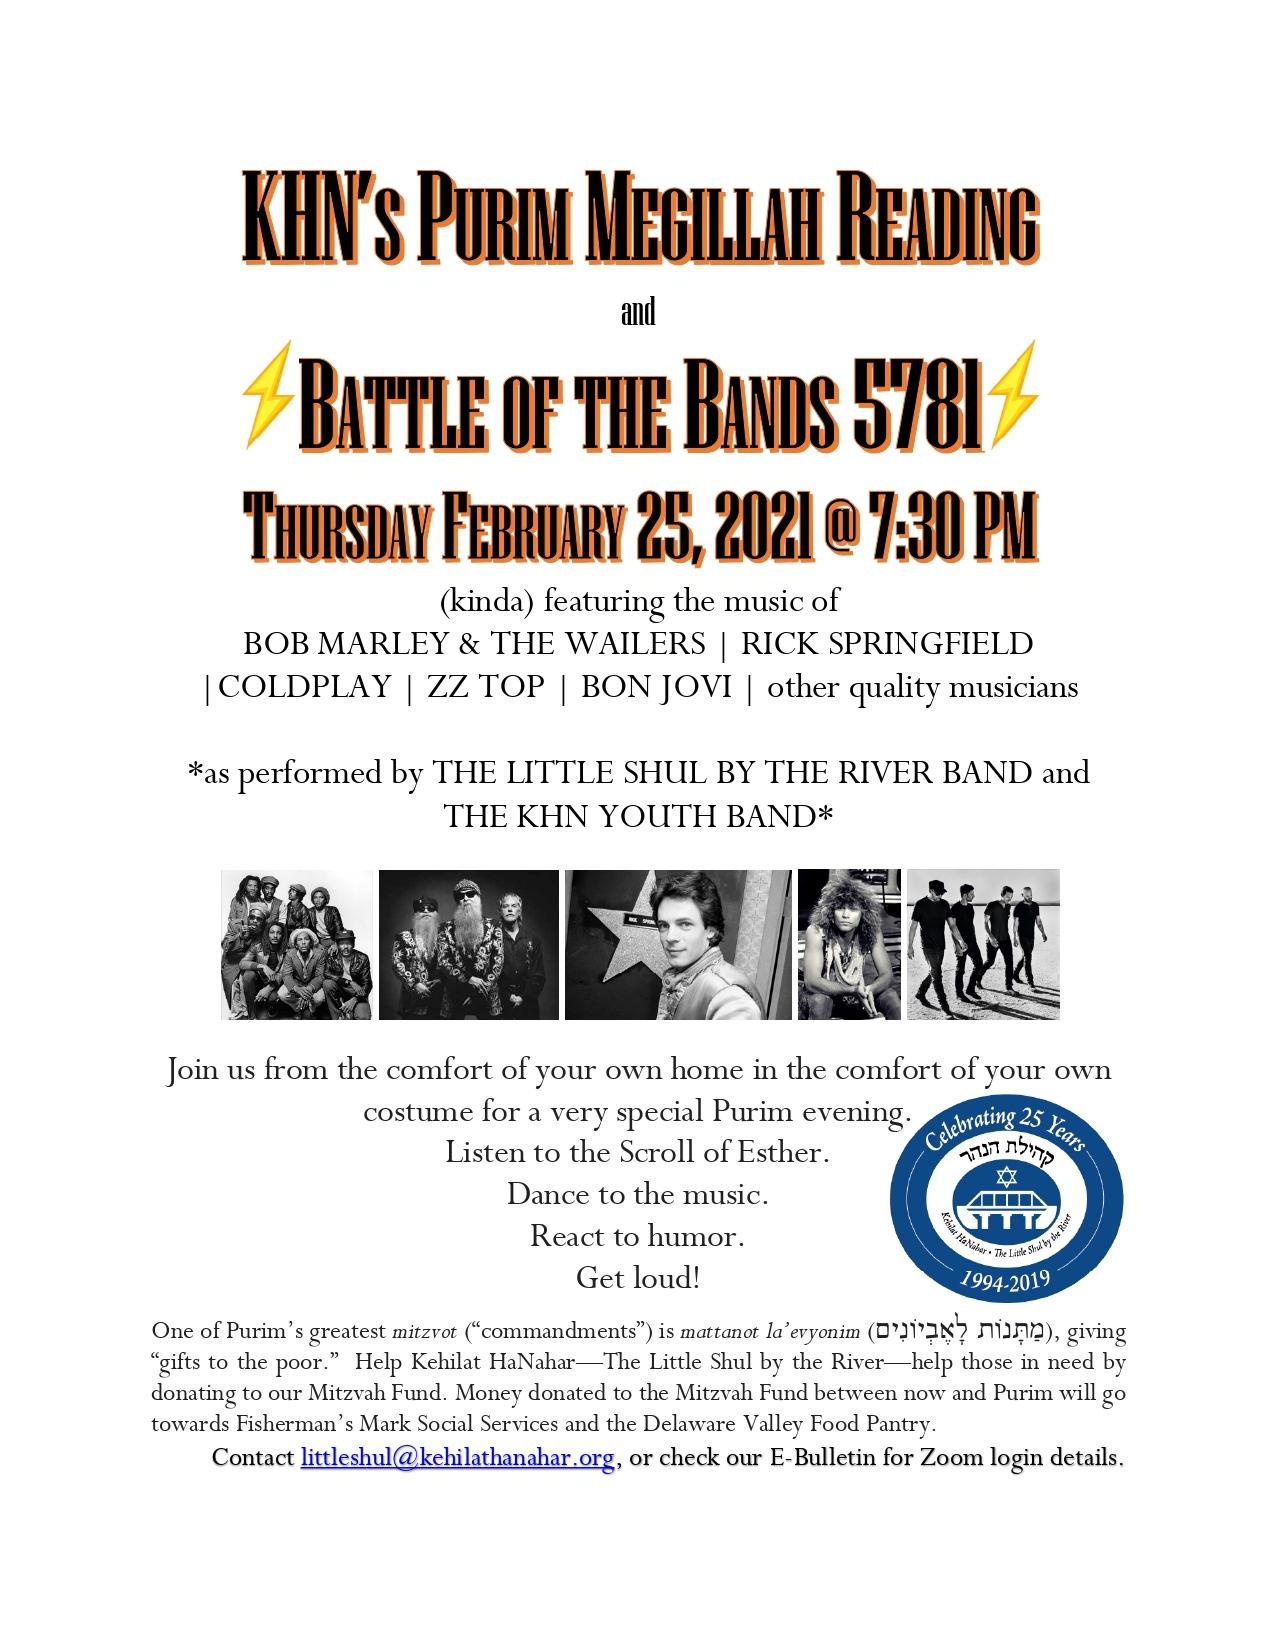 Banner Image for Purim Battle of the Bands & Megillah Reading